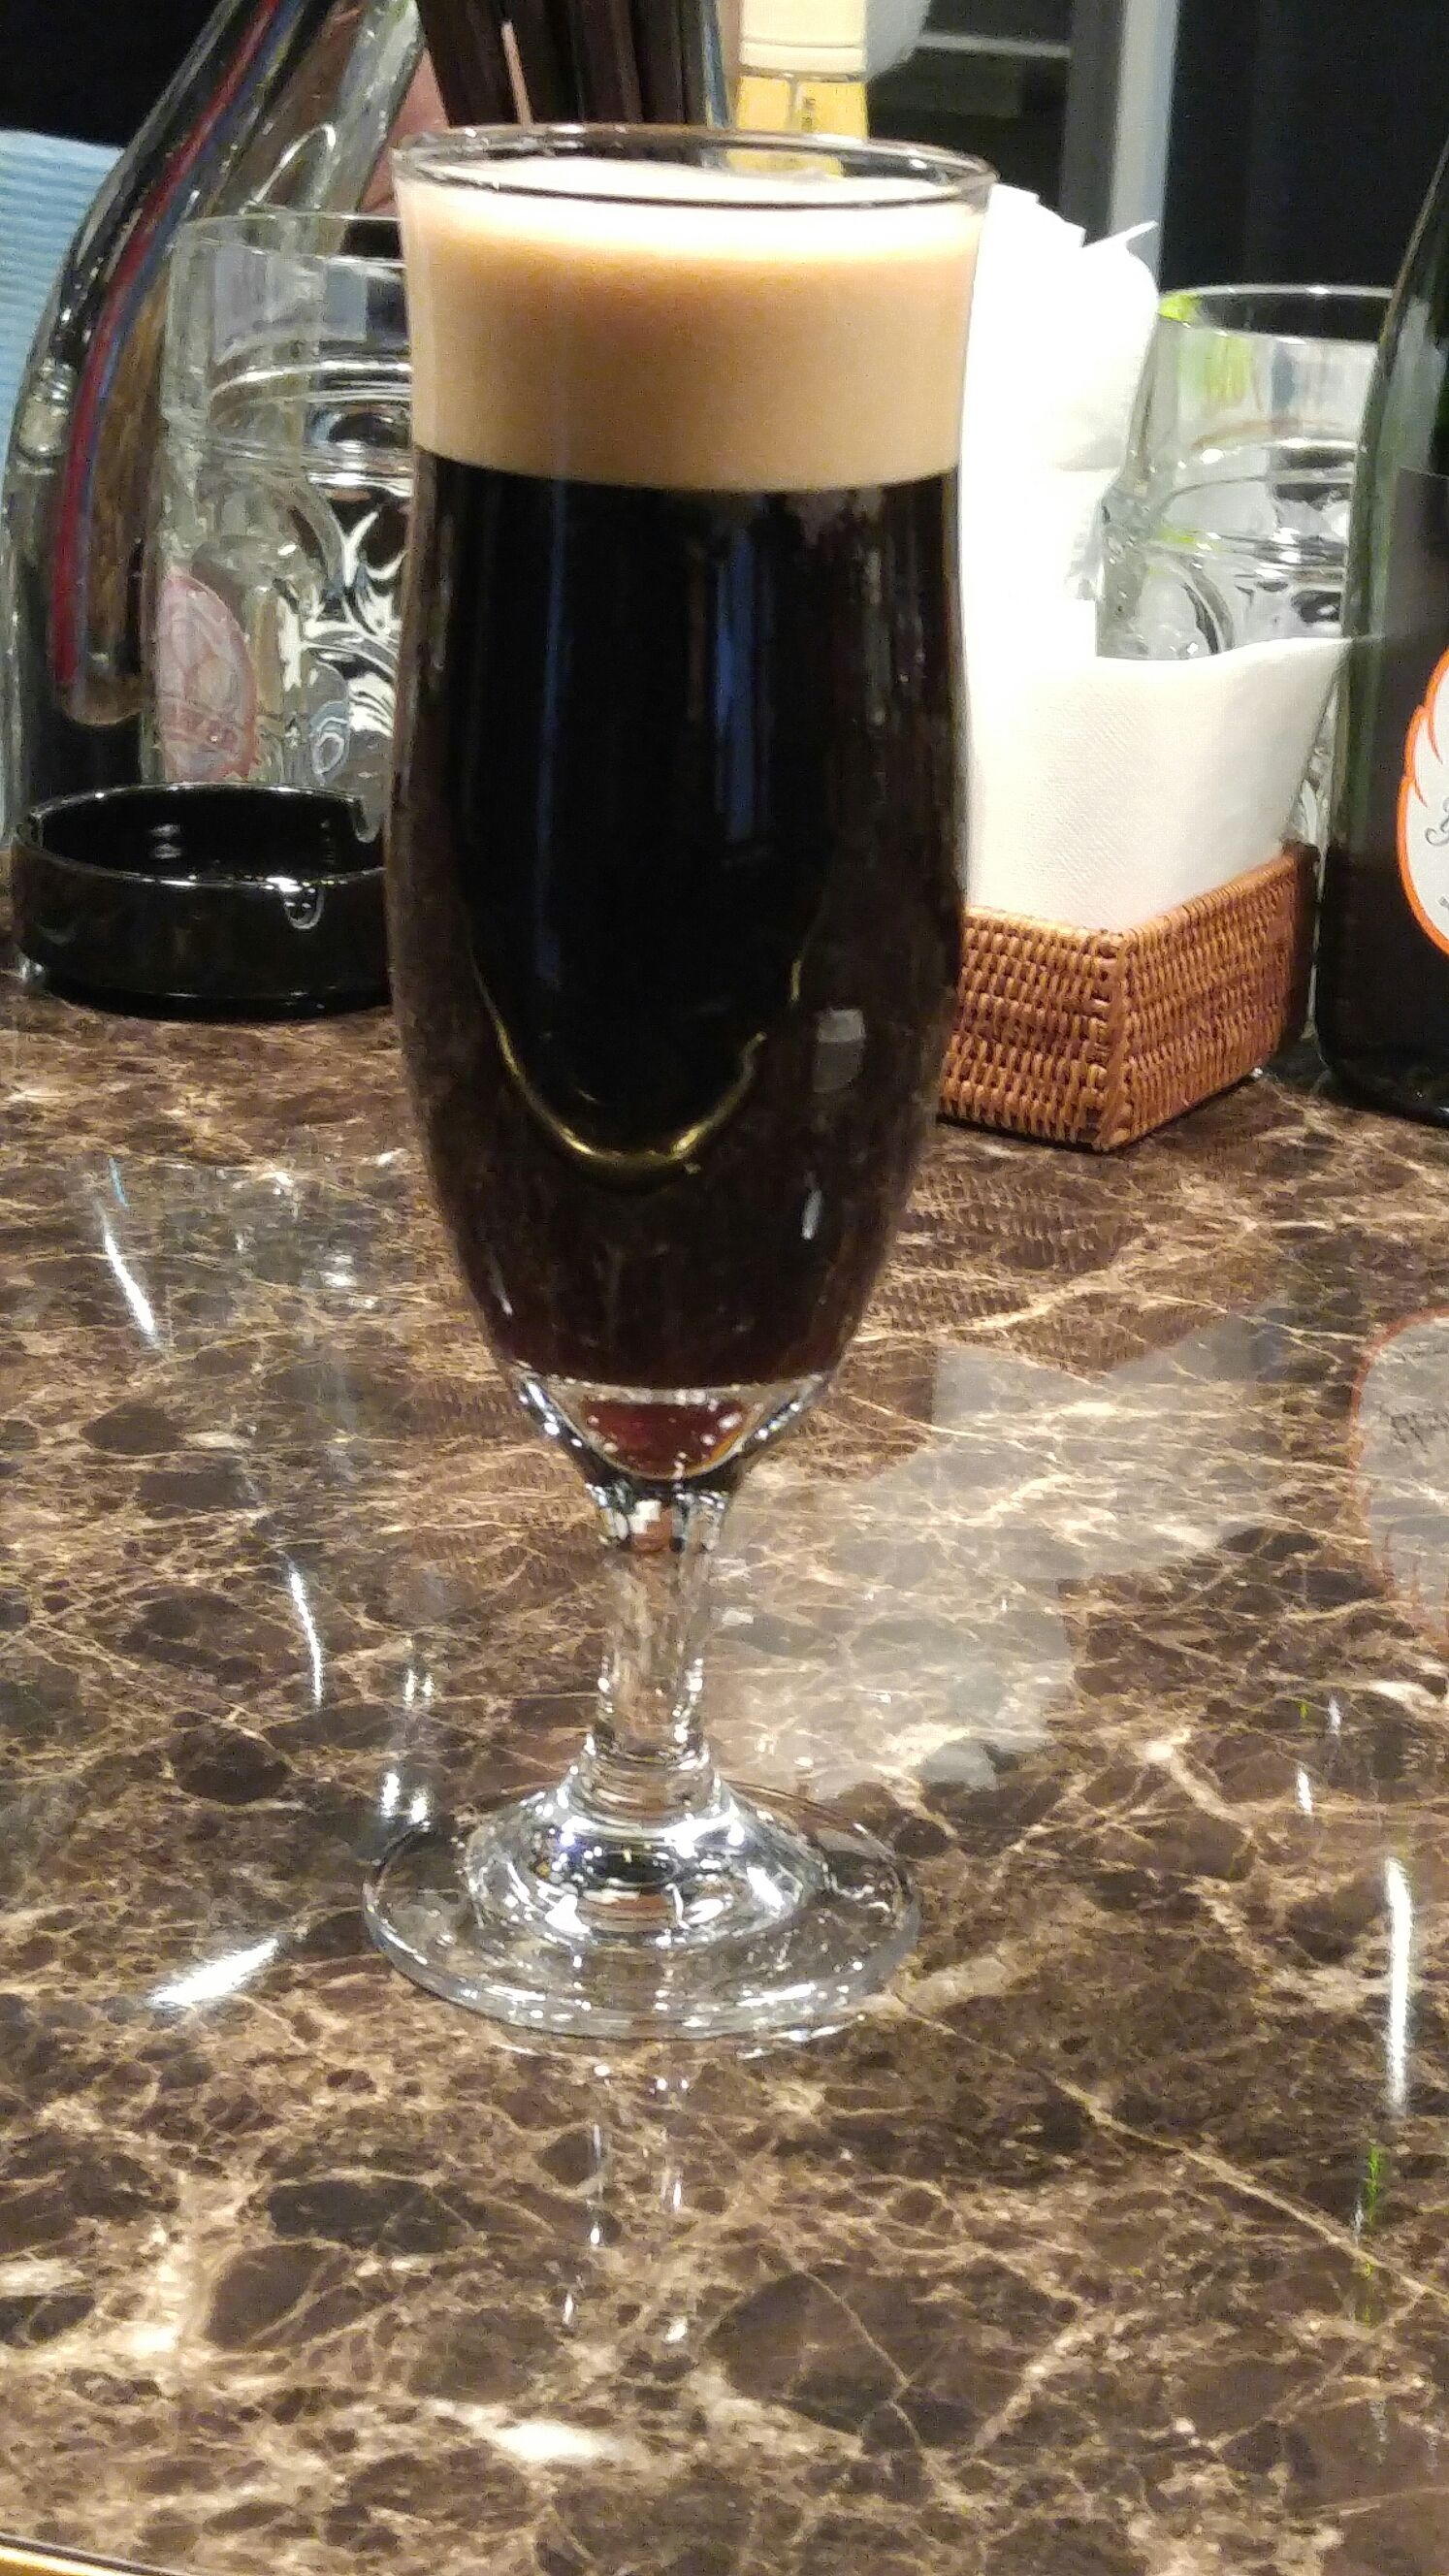 Shizuoka Craft Beer: Aoi Brewing-Kuro Coco Stout Porter ...